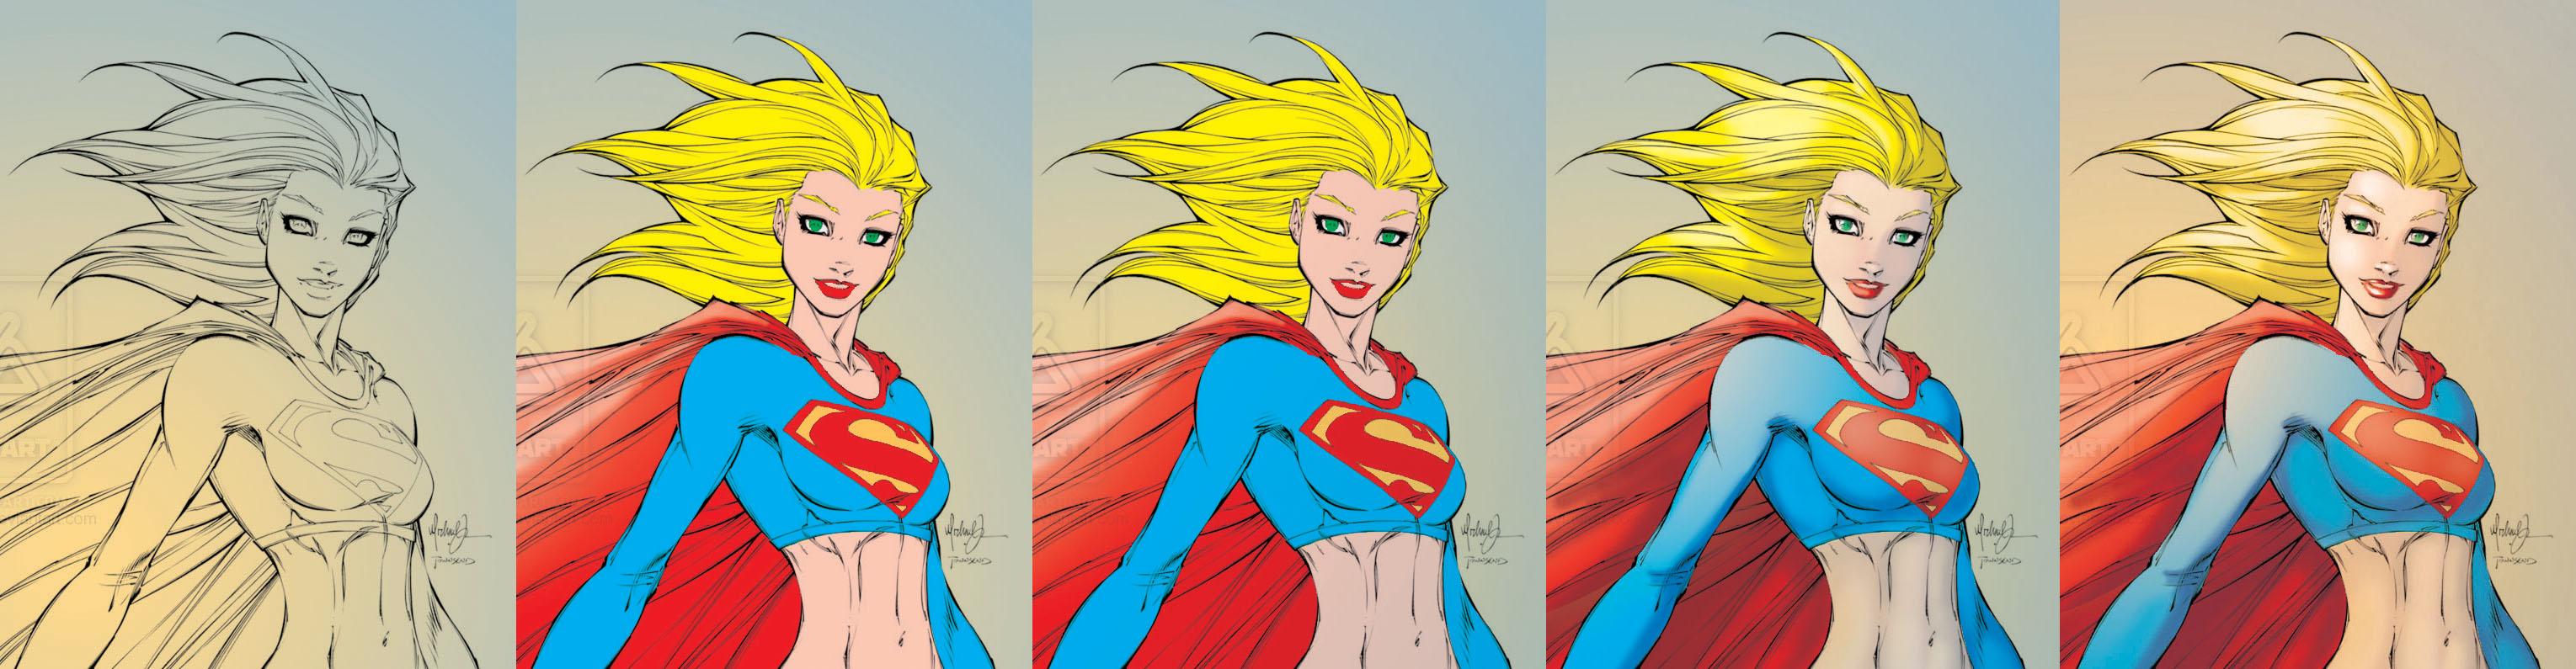 Supergirl Coloring Steps by Marc-F-Huizinga on DeviantArt